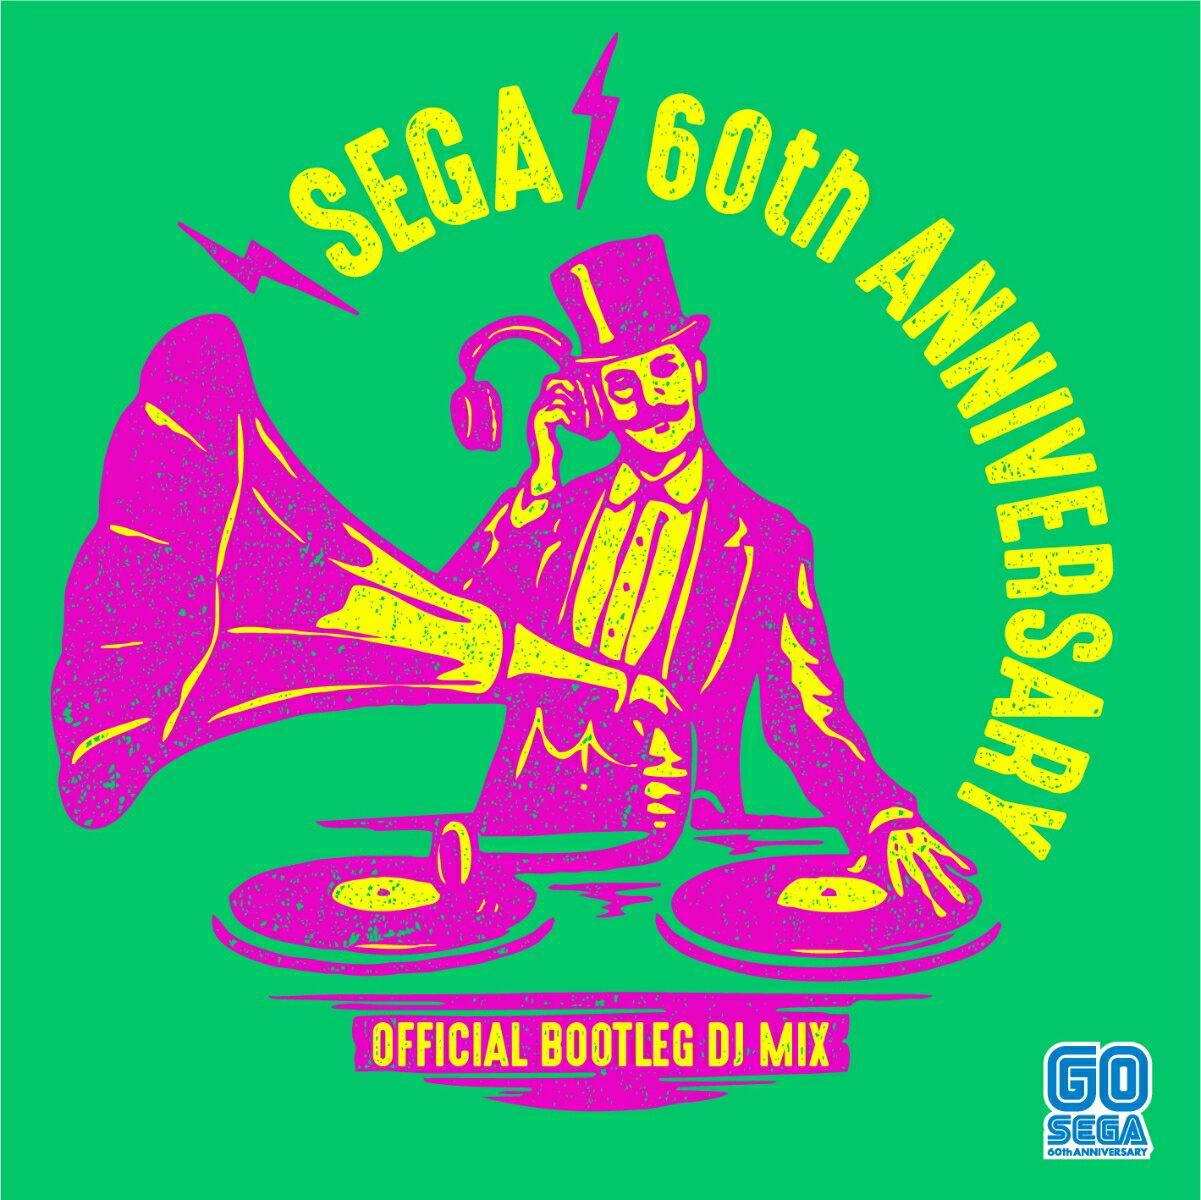 SEGA 60th Anniversary Official Bootleg DJ Mix画像